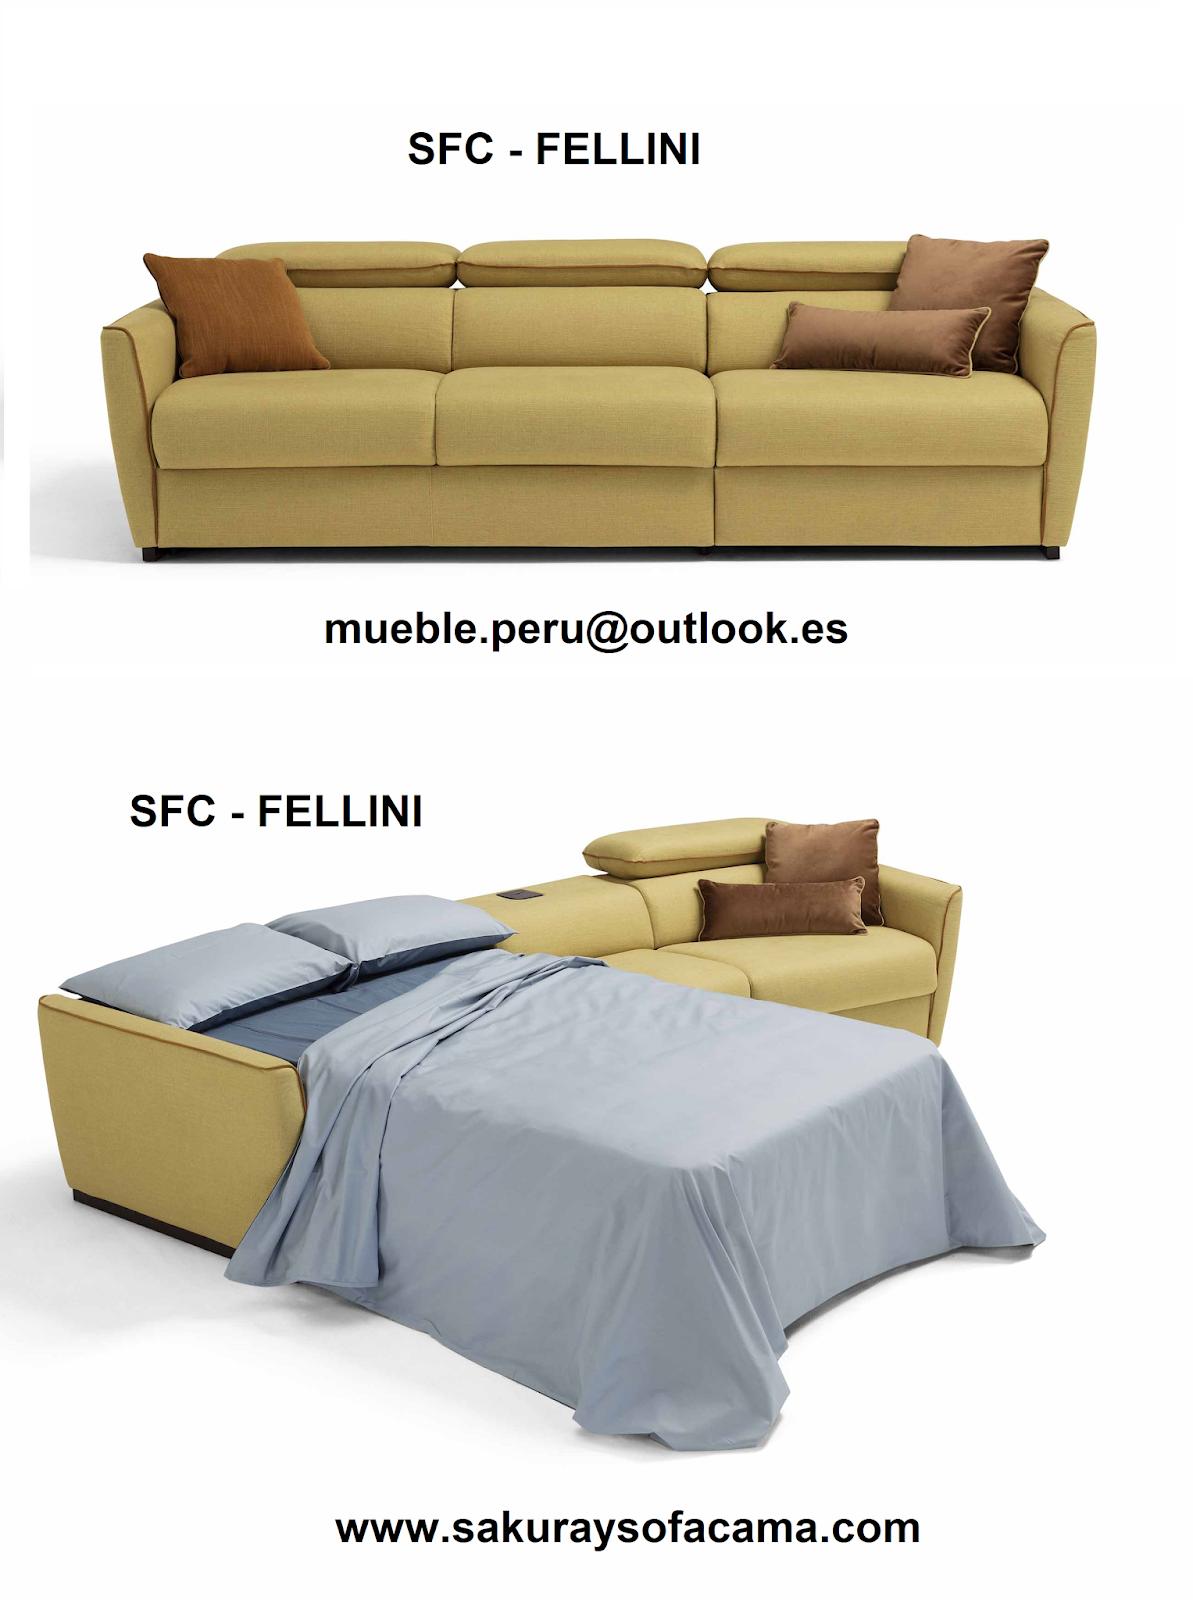 sofa sfc southern beds uk mueble peru sakuray cama seccional fellini